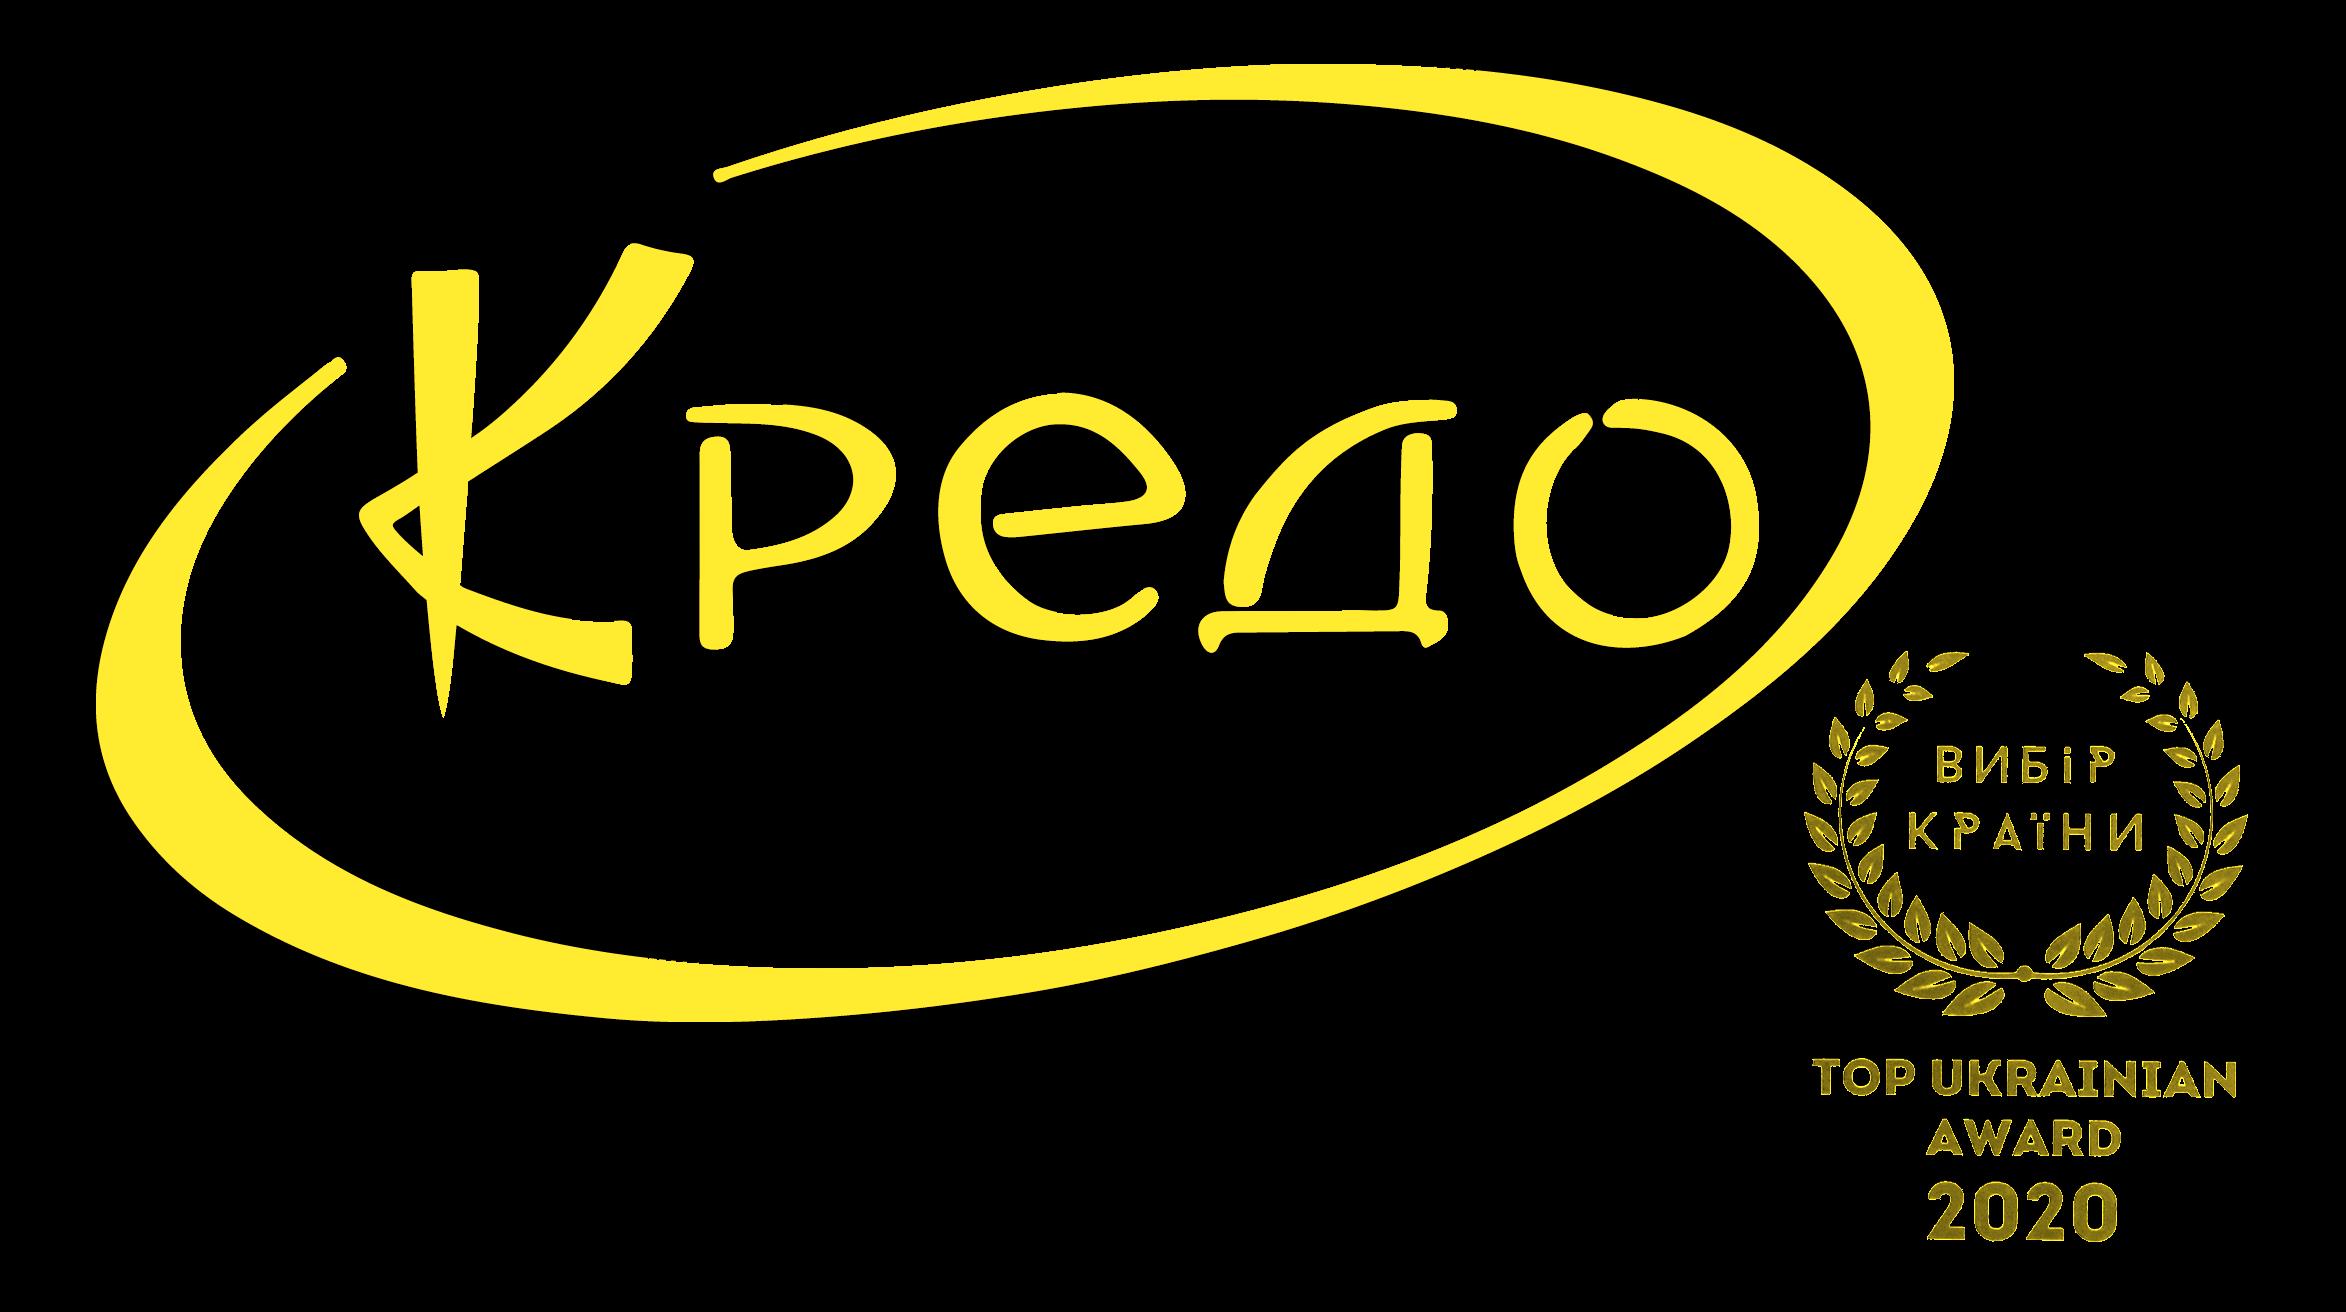 ПП Кредо українська фабрика взуття